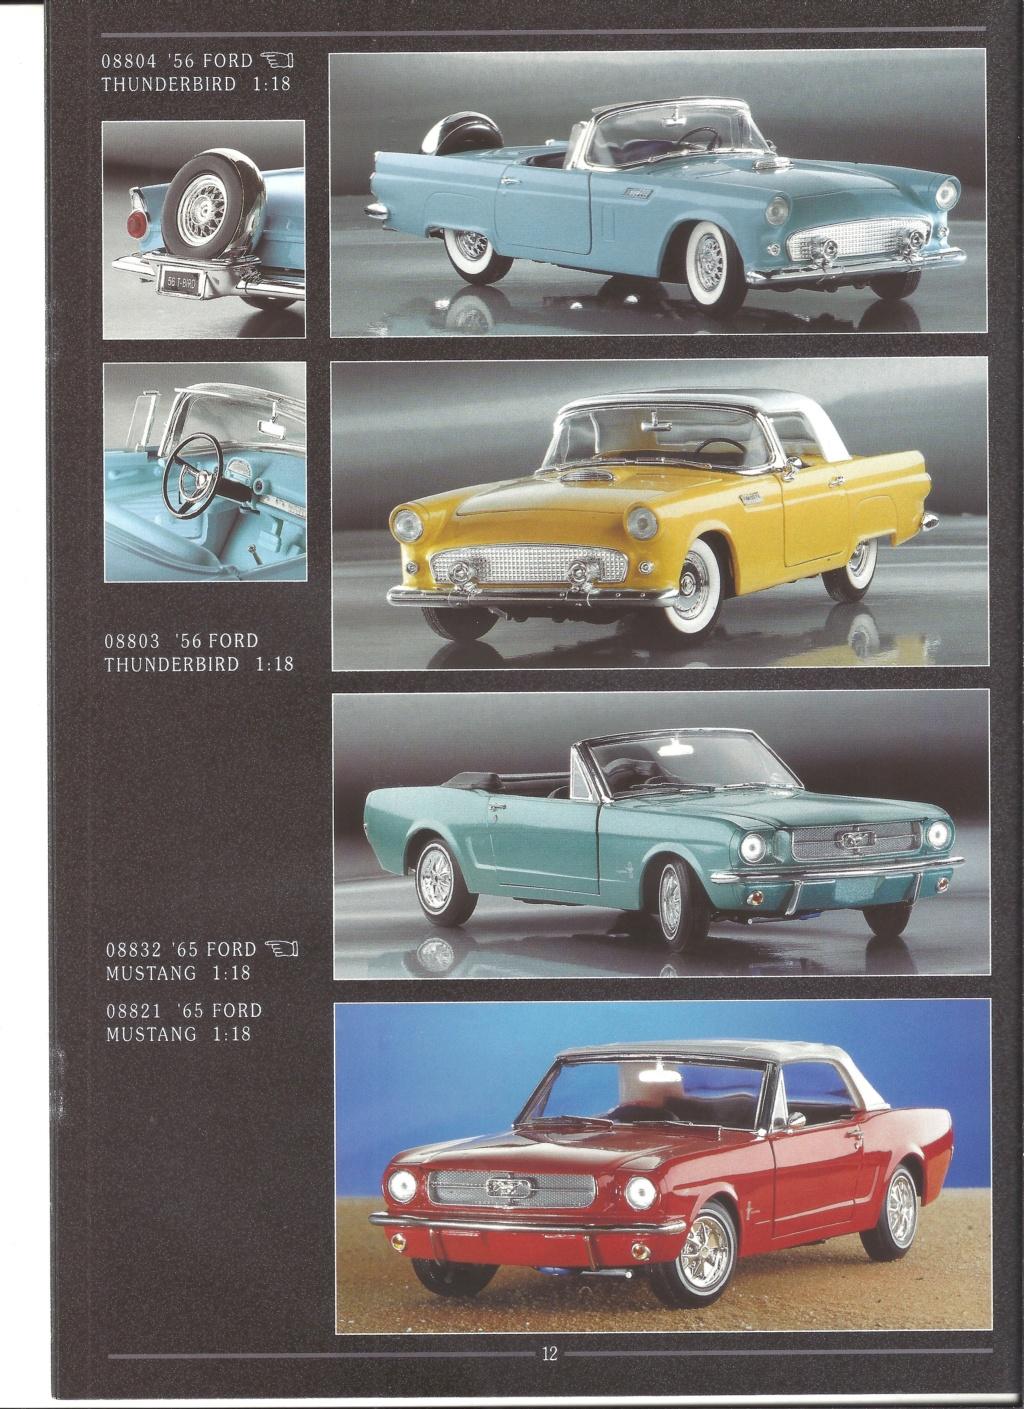 [REVELL 1995] Catalogue METAL miniatures 1995  Revell43